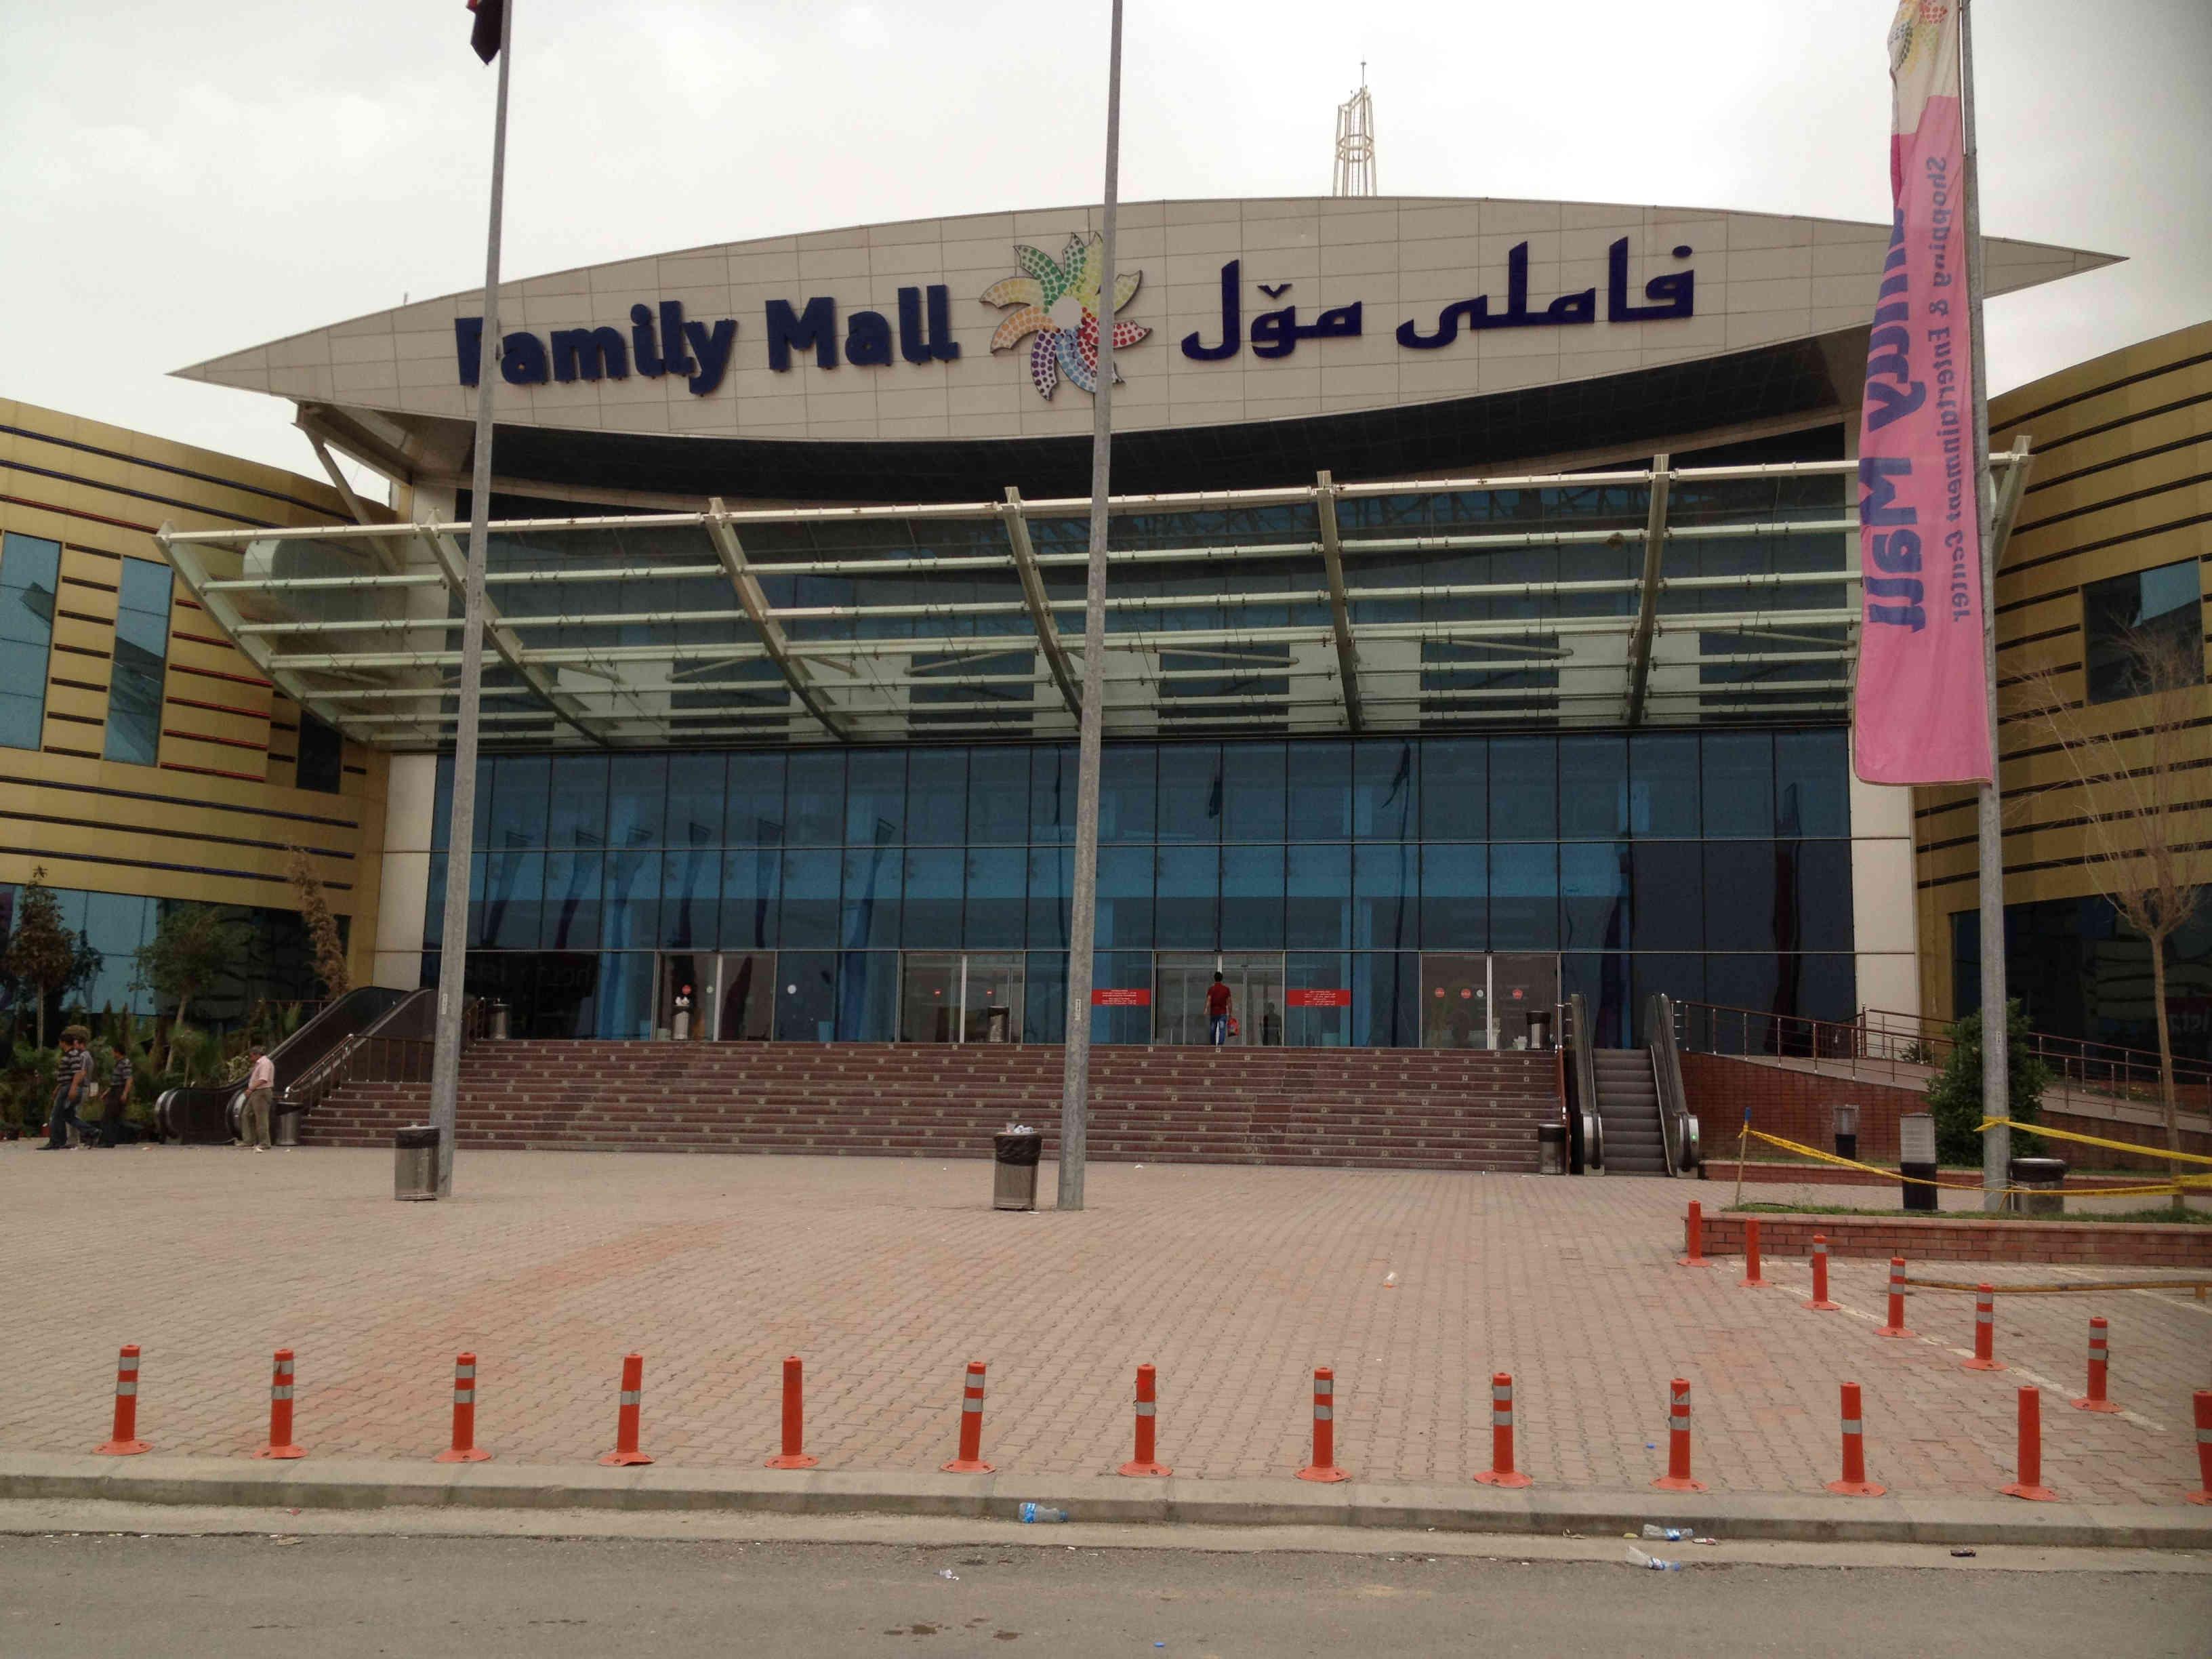 Family Mall Shops